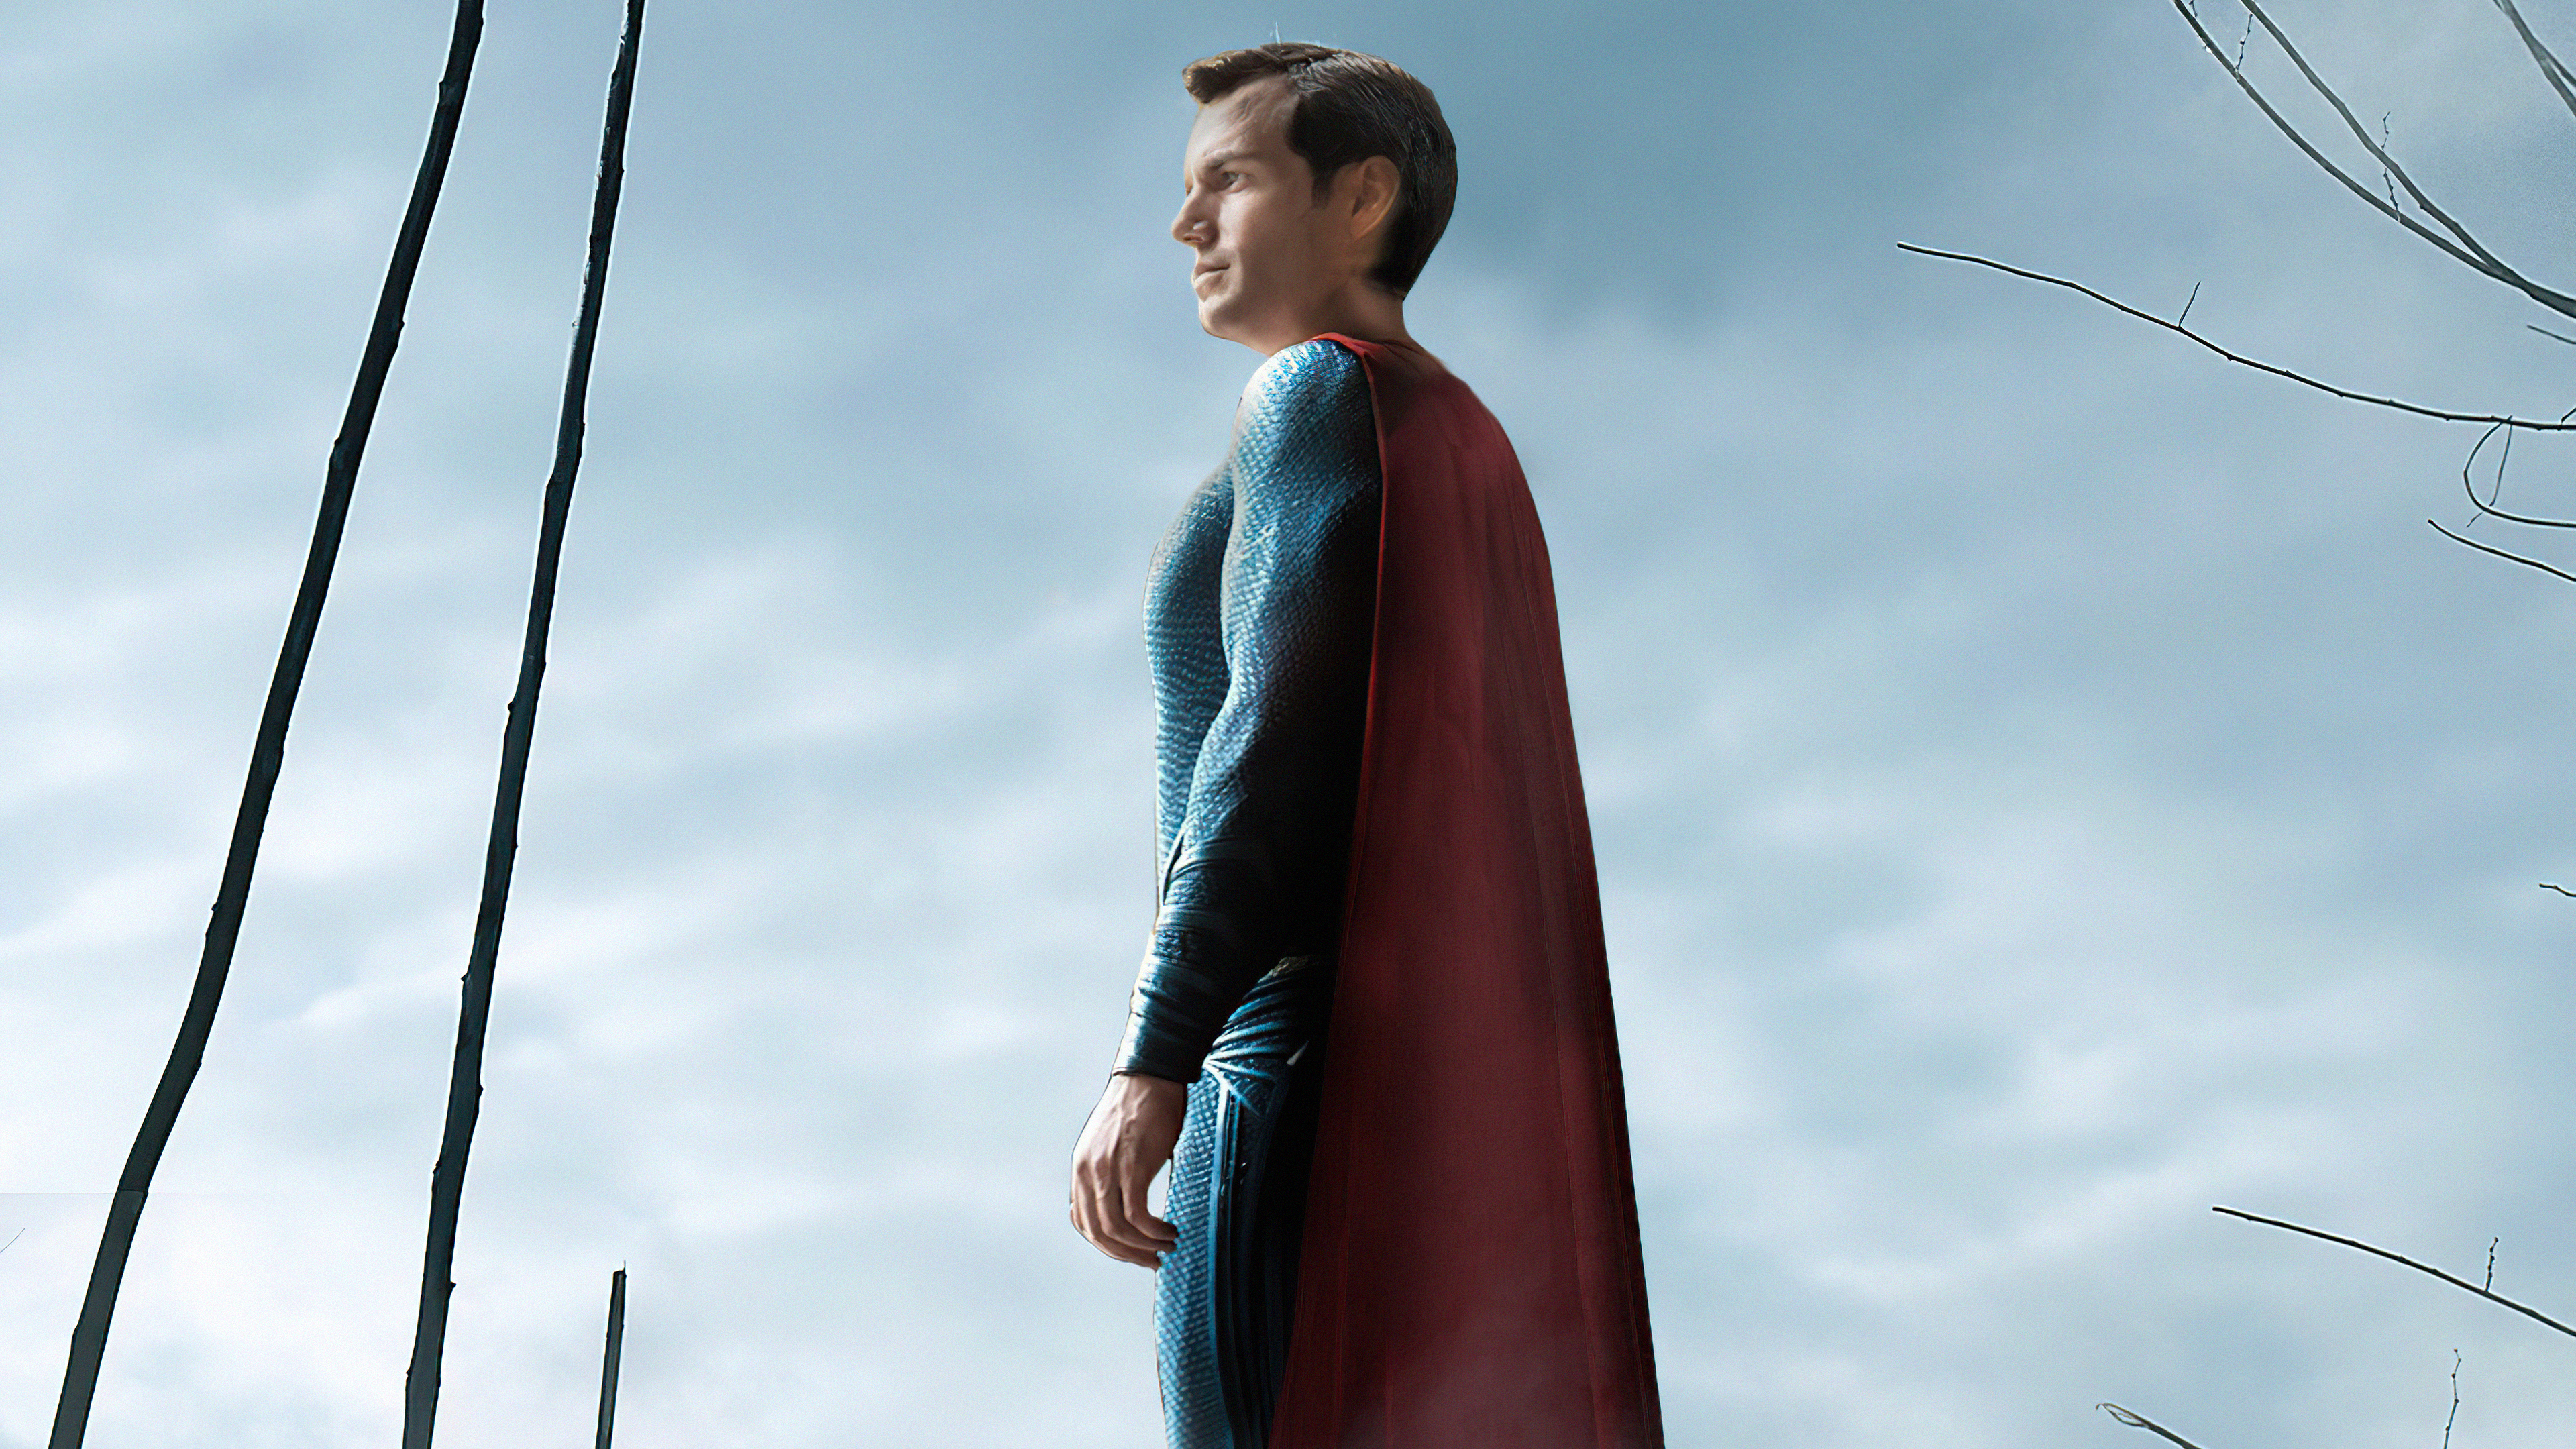 the kryptonian superman 4k 1617446727 - The Kryptonian Superman 4k - The Kryptonian Superman 4k wallpapers